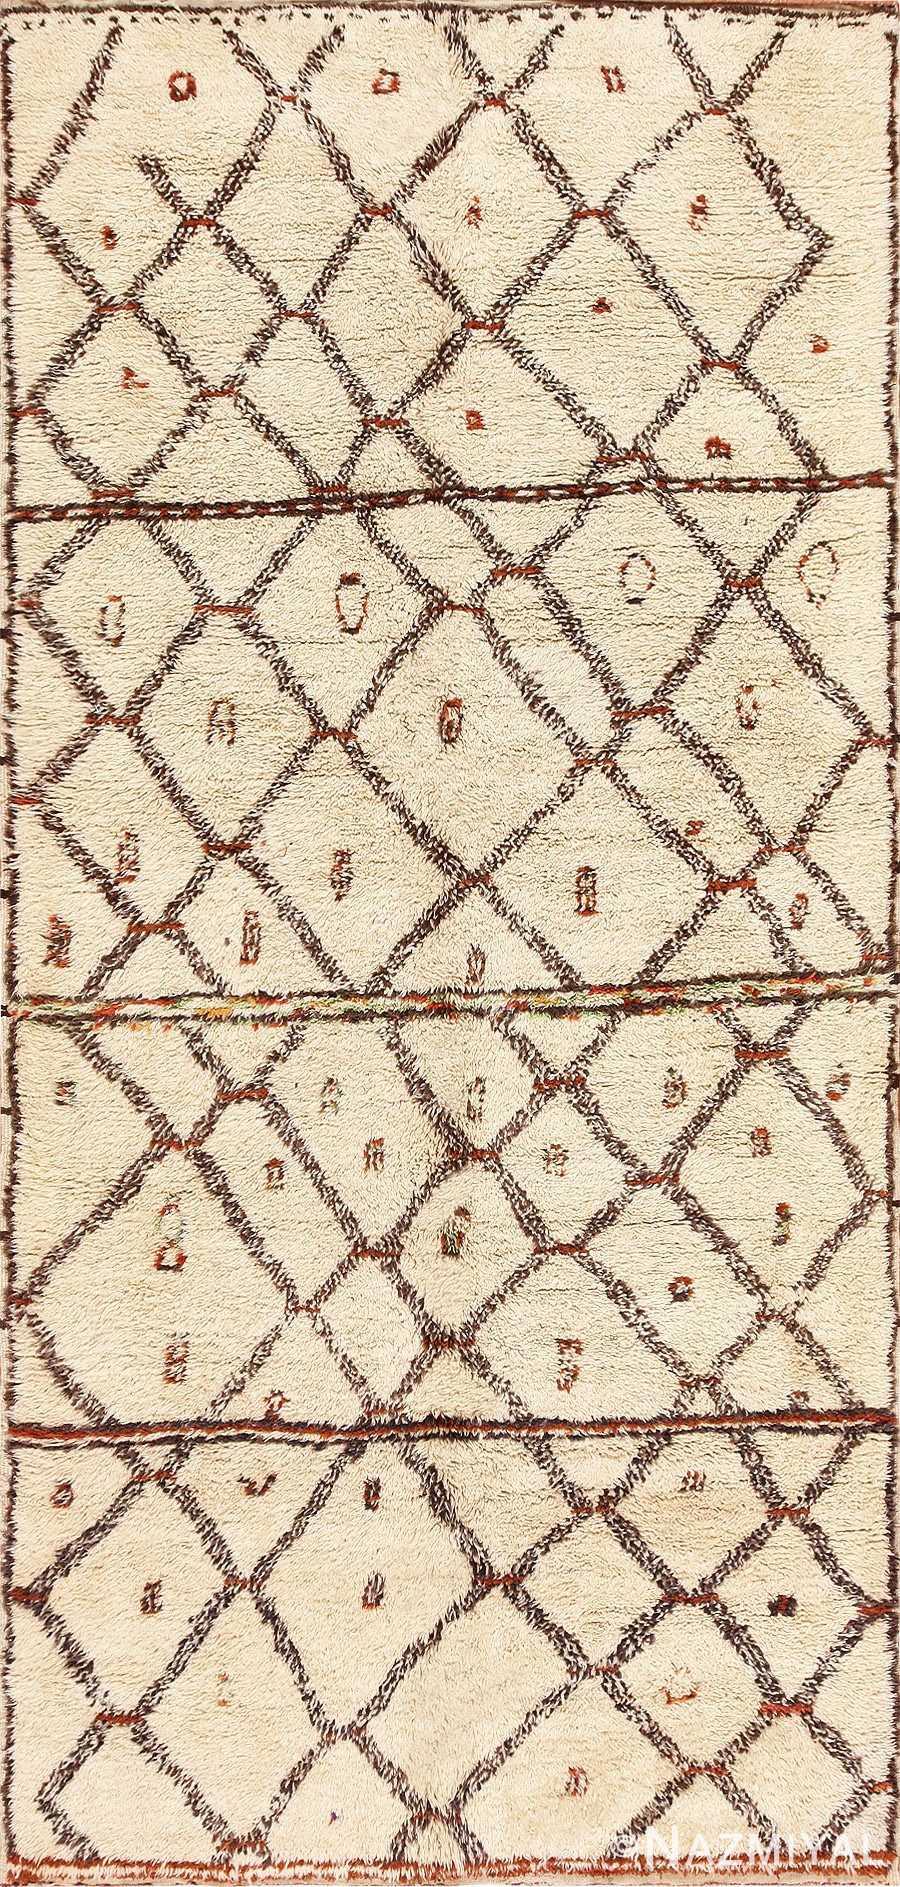 Ivory Vintage Moroccan Rug 47931 Detail/Large View